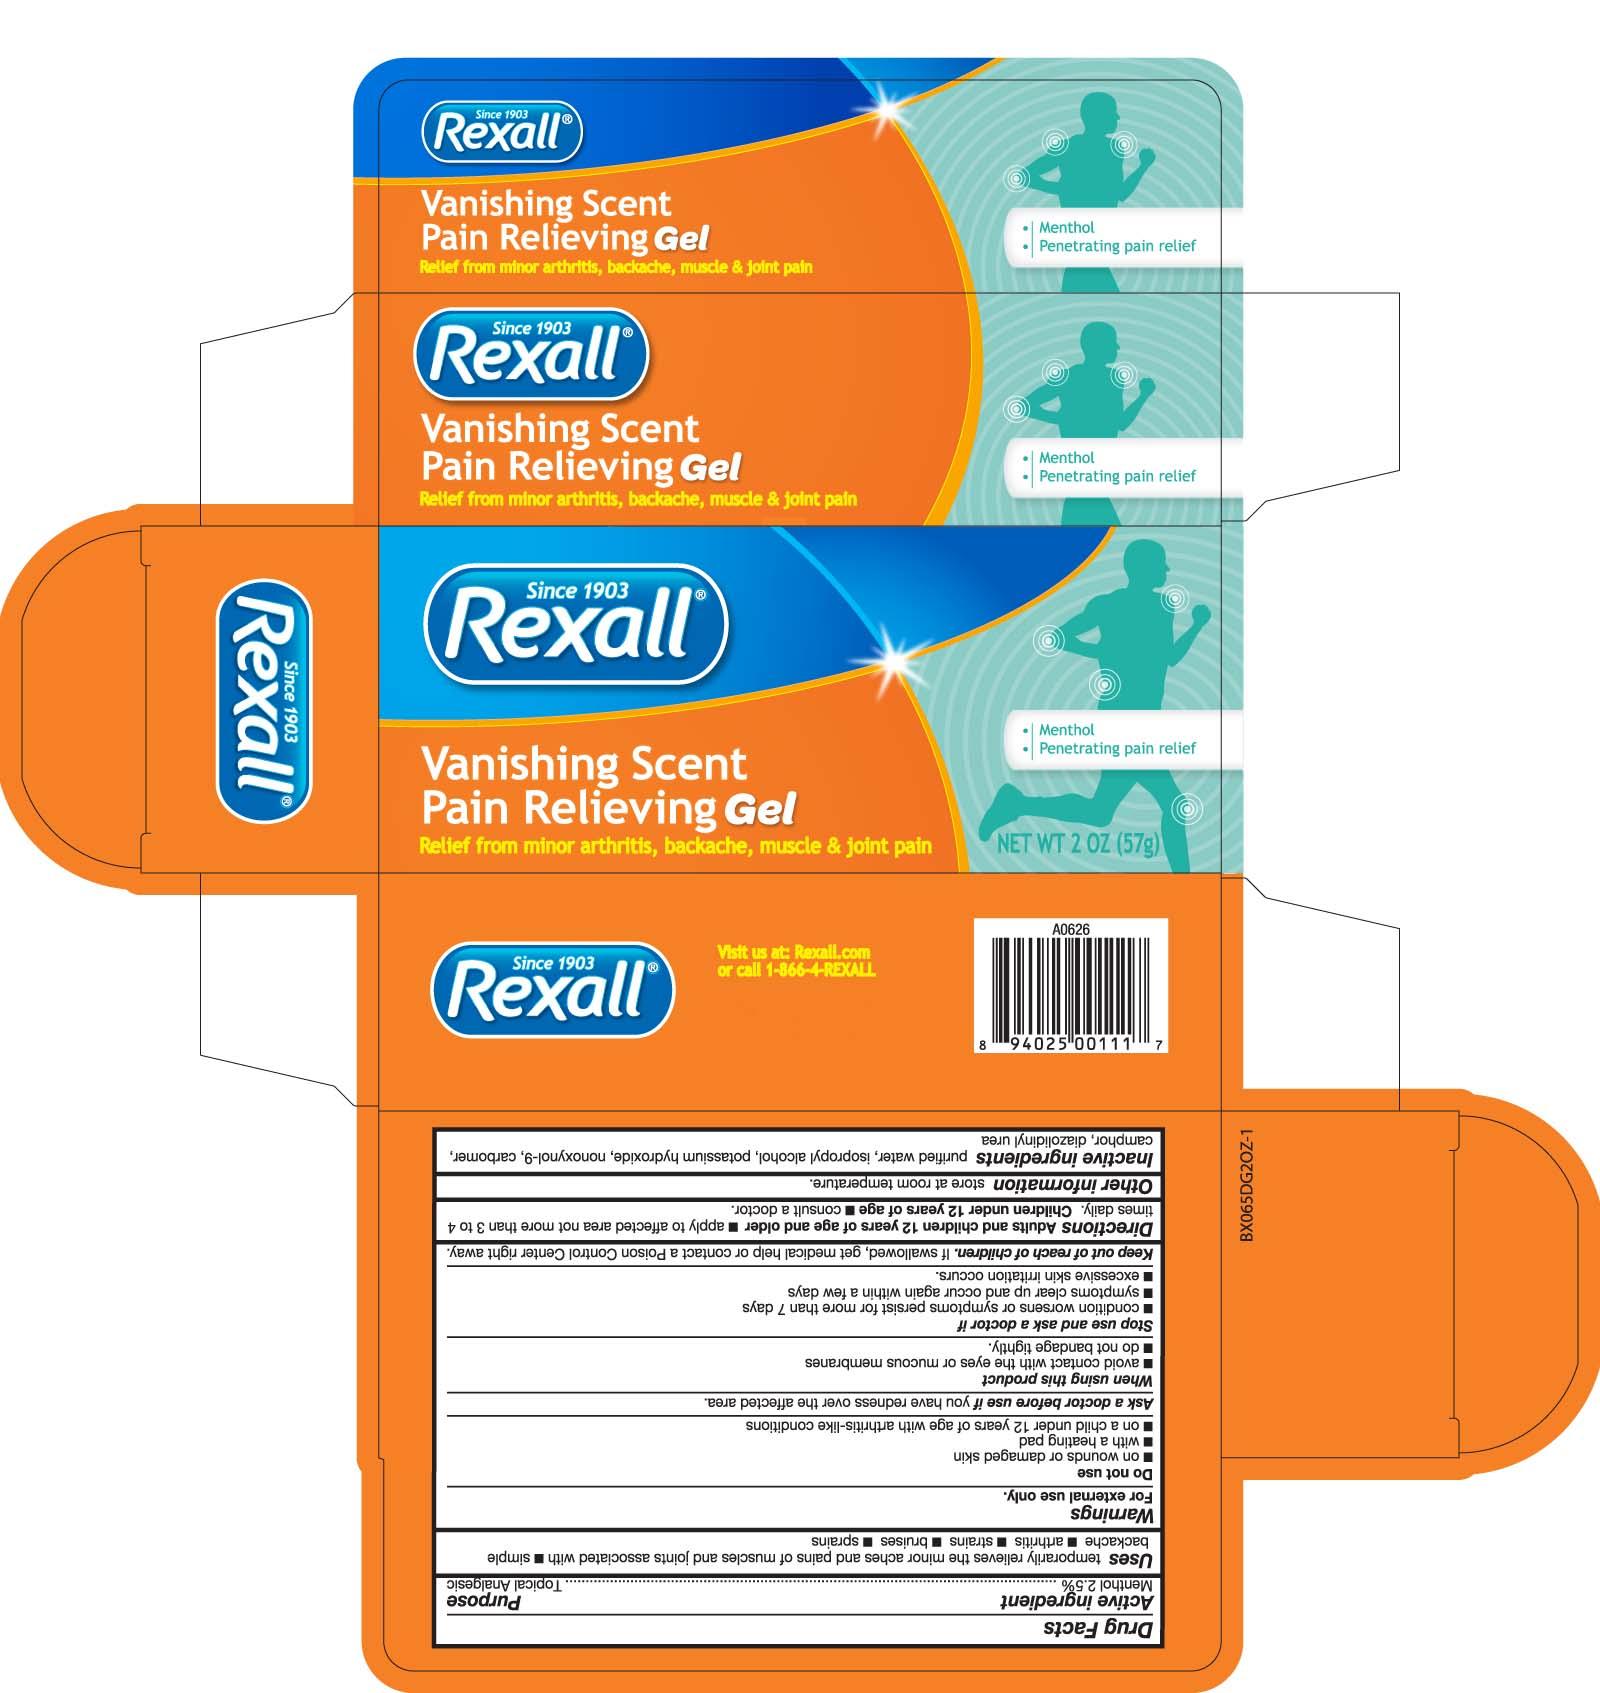 Rexall Vanishing Scent Pain Relieving (Menthol) Gel [Dolgencorp, Llc]